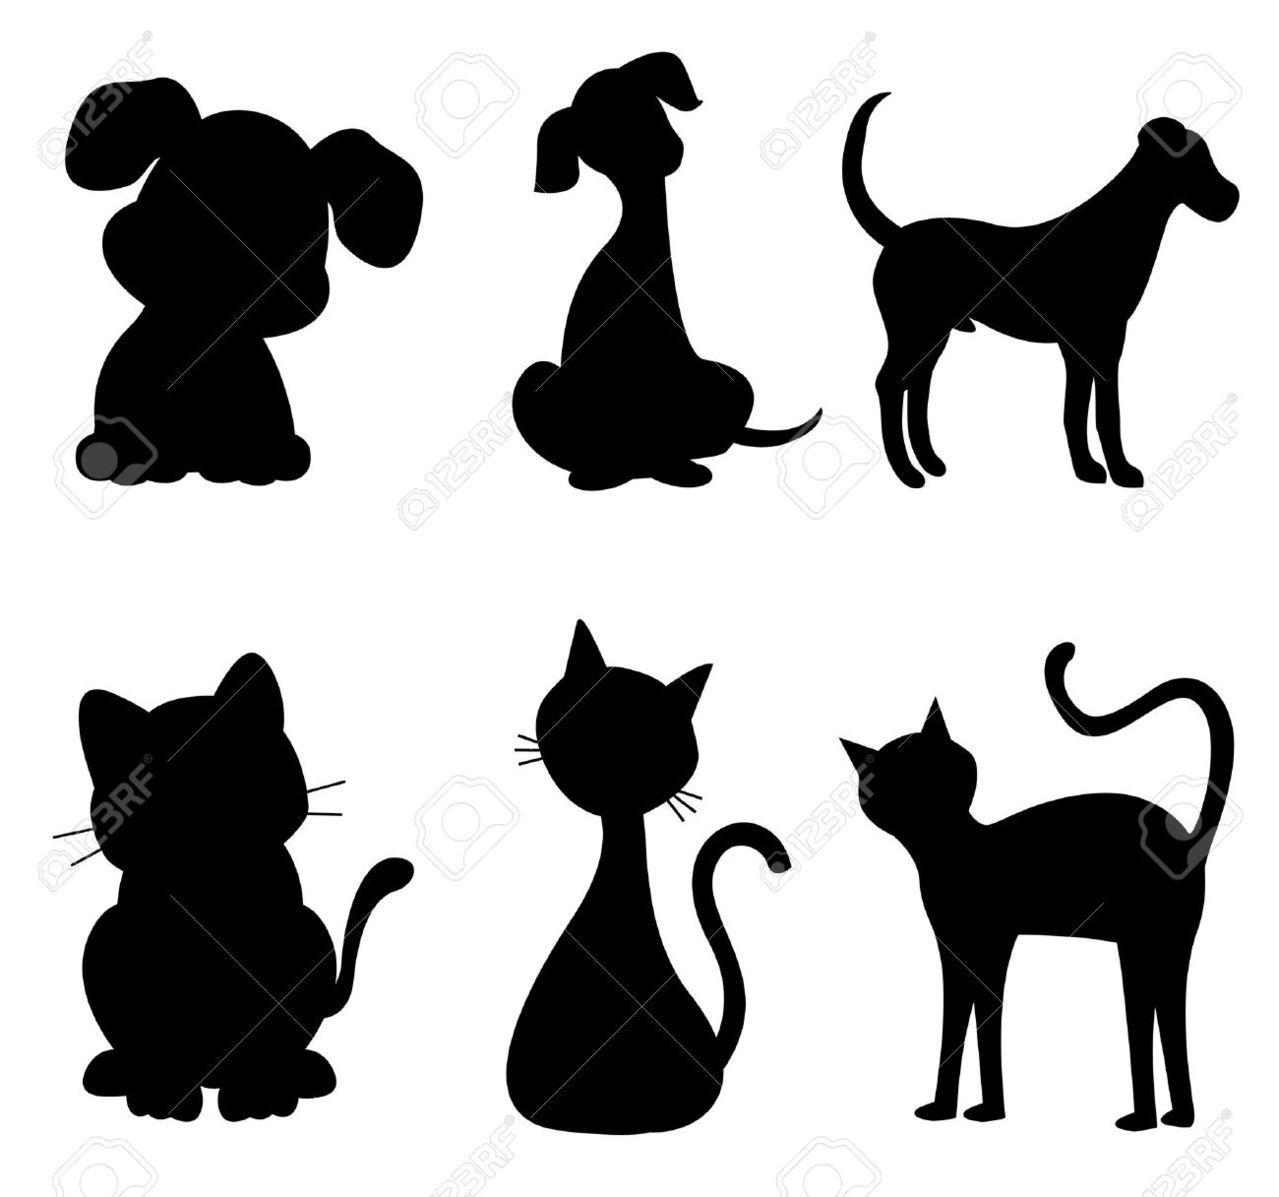 Disegni Stilizzati Cani E Gatti Disegni Di Cane